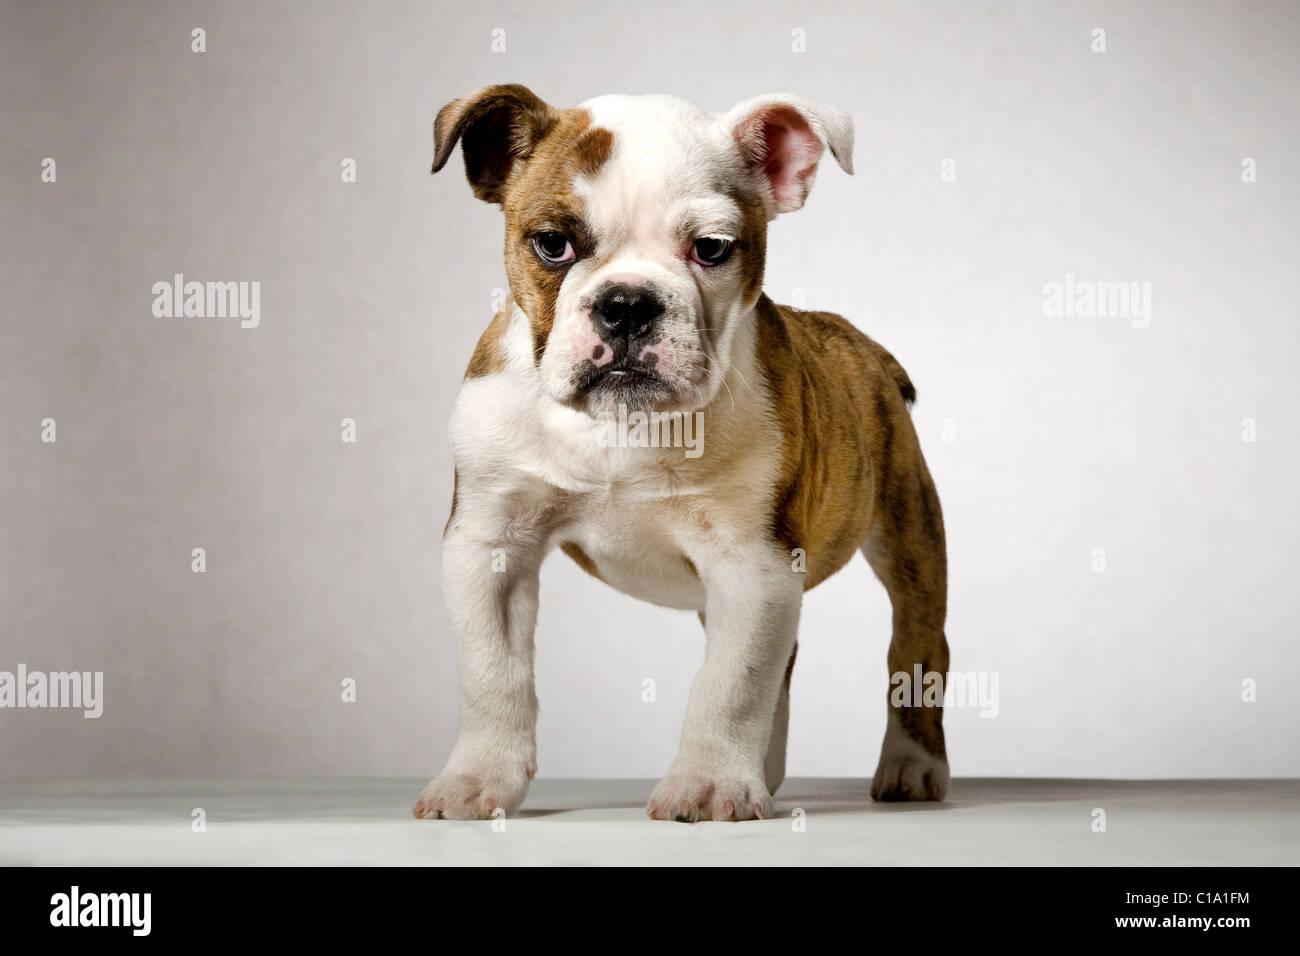 English bulldog pup (Canis lupus familiaris), UK - Stock Image